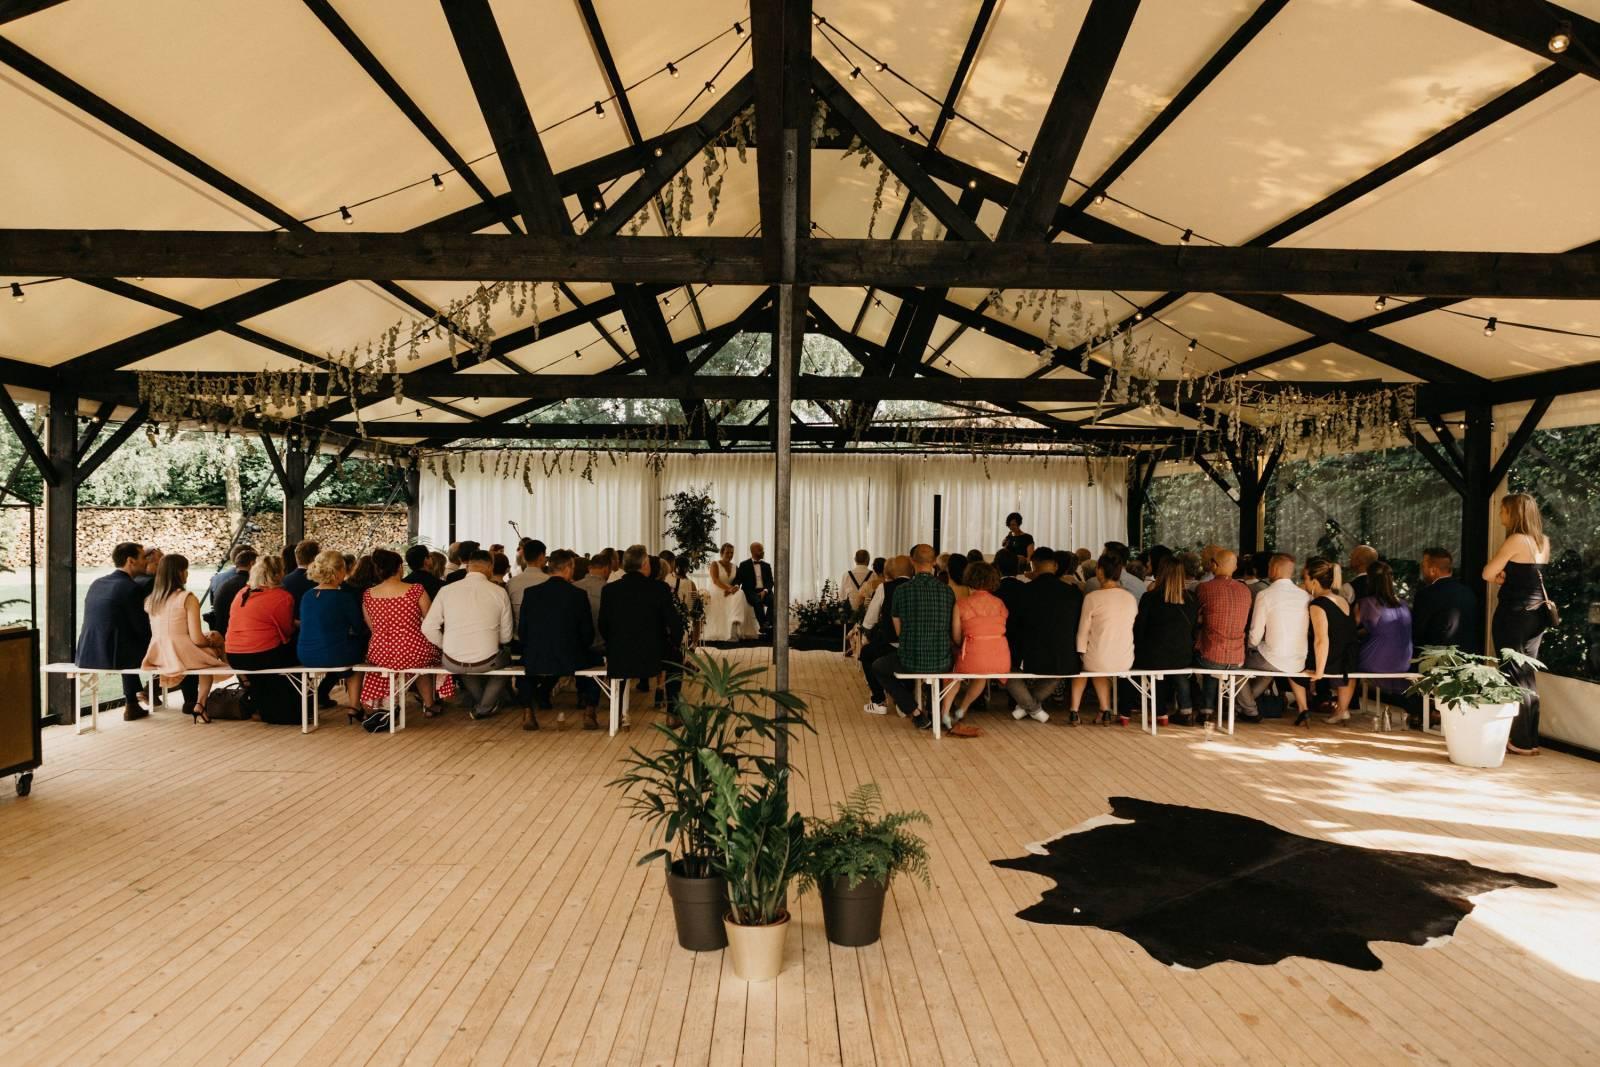 Tine De Donder - Huwelijksceremonie - Ceremoniespreker - Mathias Hannes - House of Weddings 15